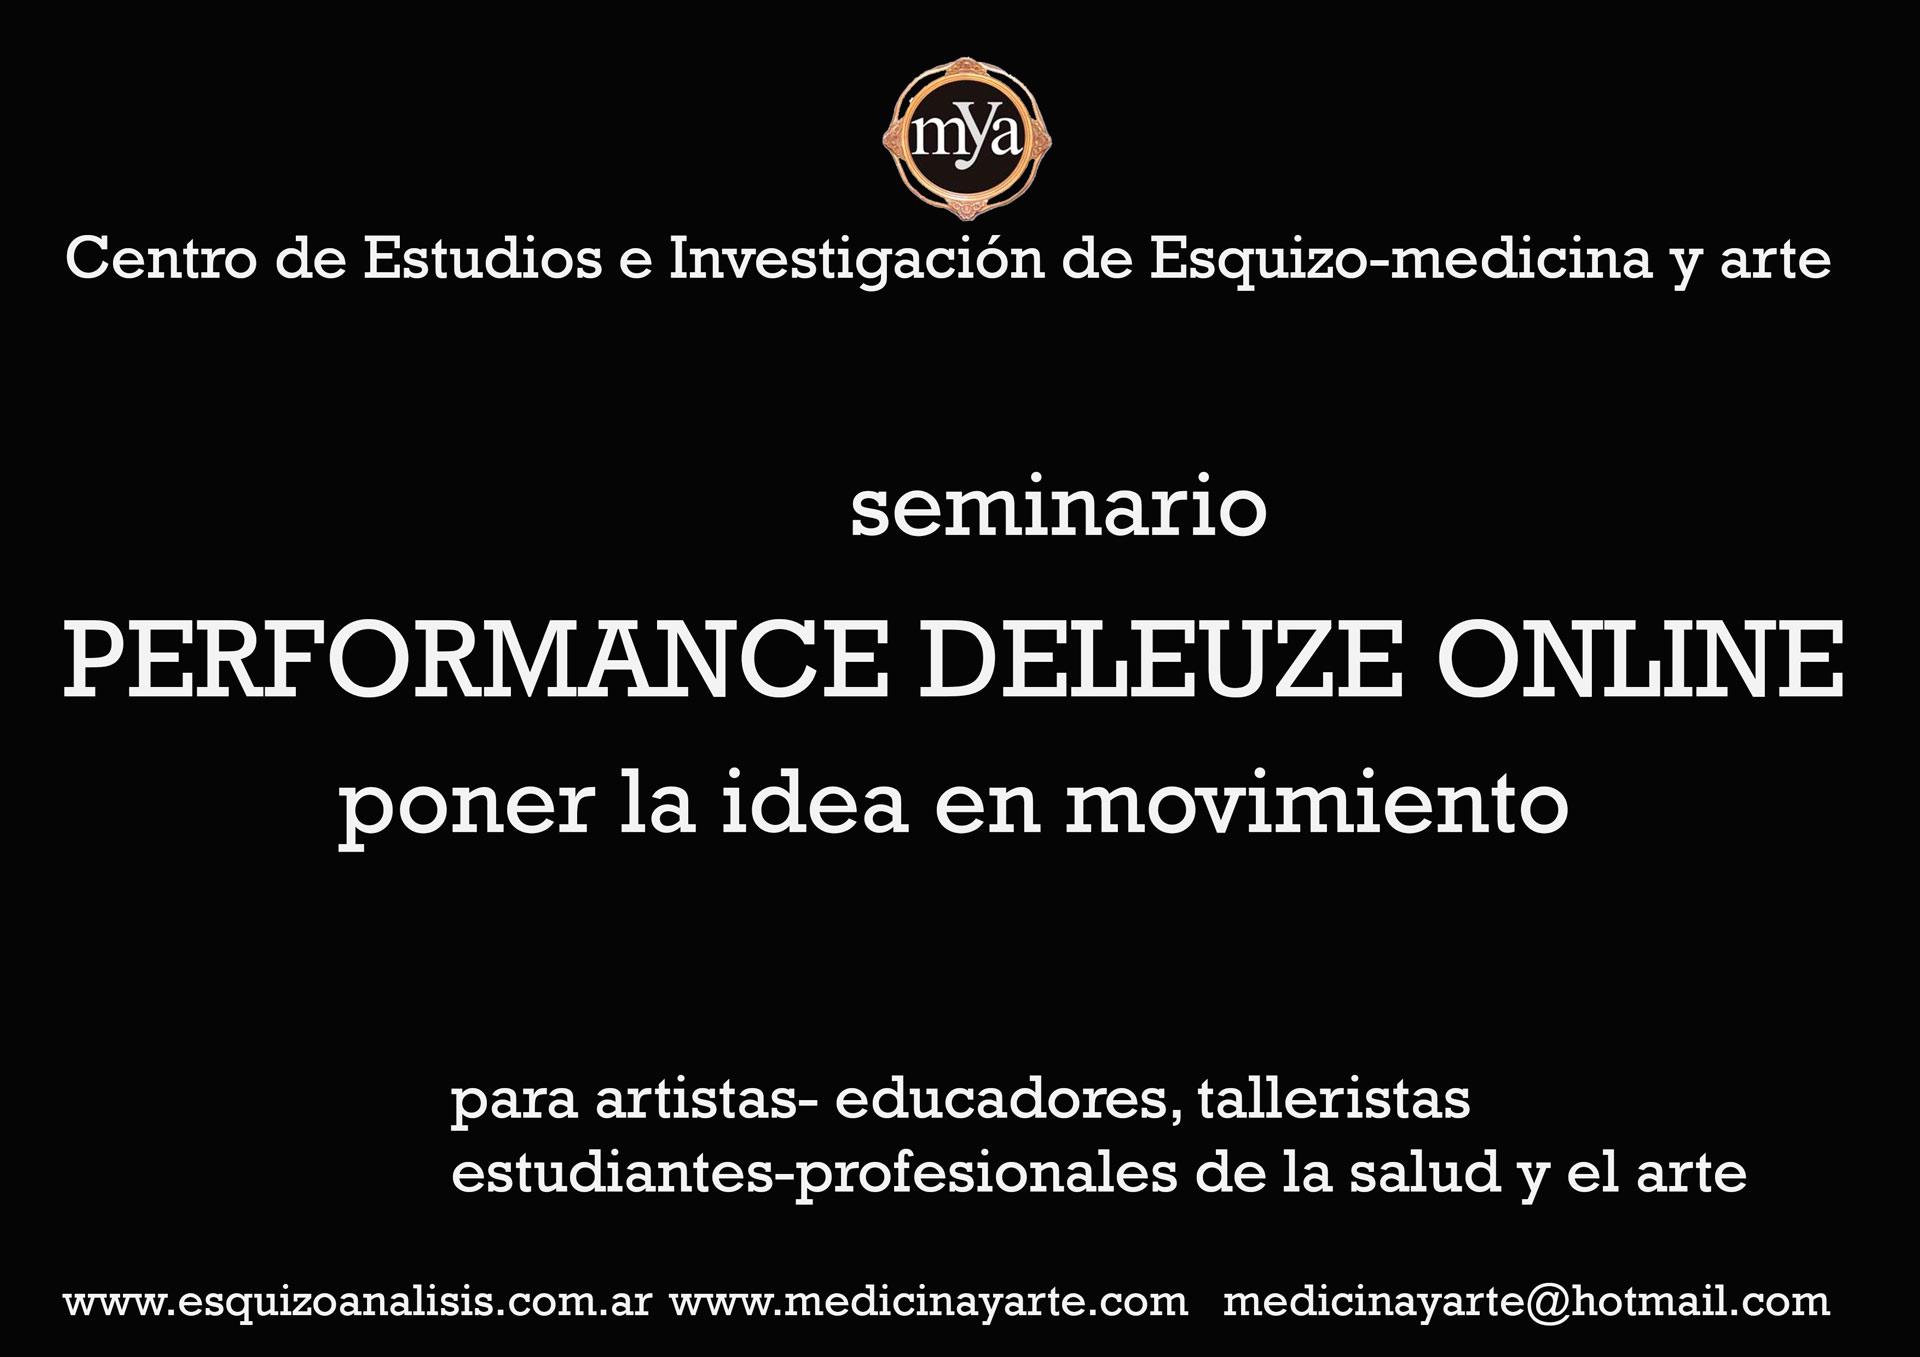 http://www.medicinayarte.com/img/performance-deleuze-1.jpg